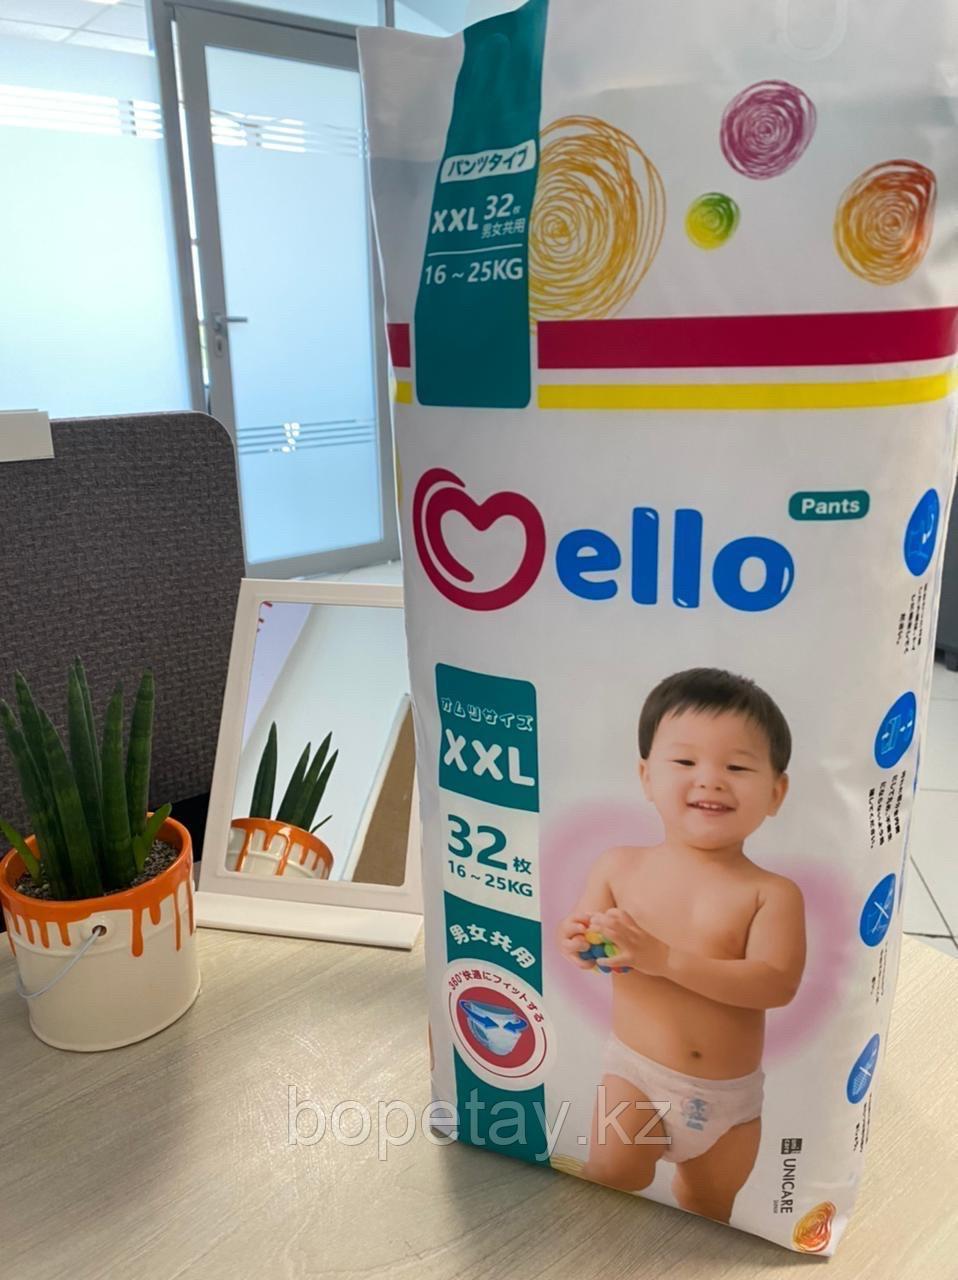 Трусики Mello XXL (16-25 кг) 32 штуки